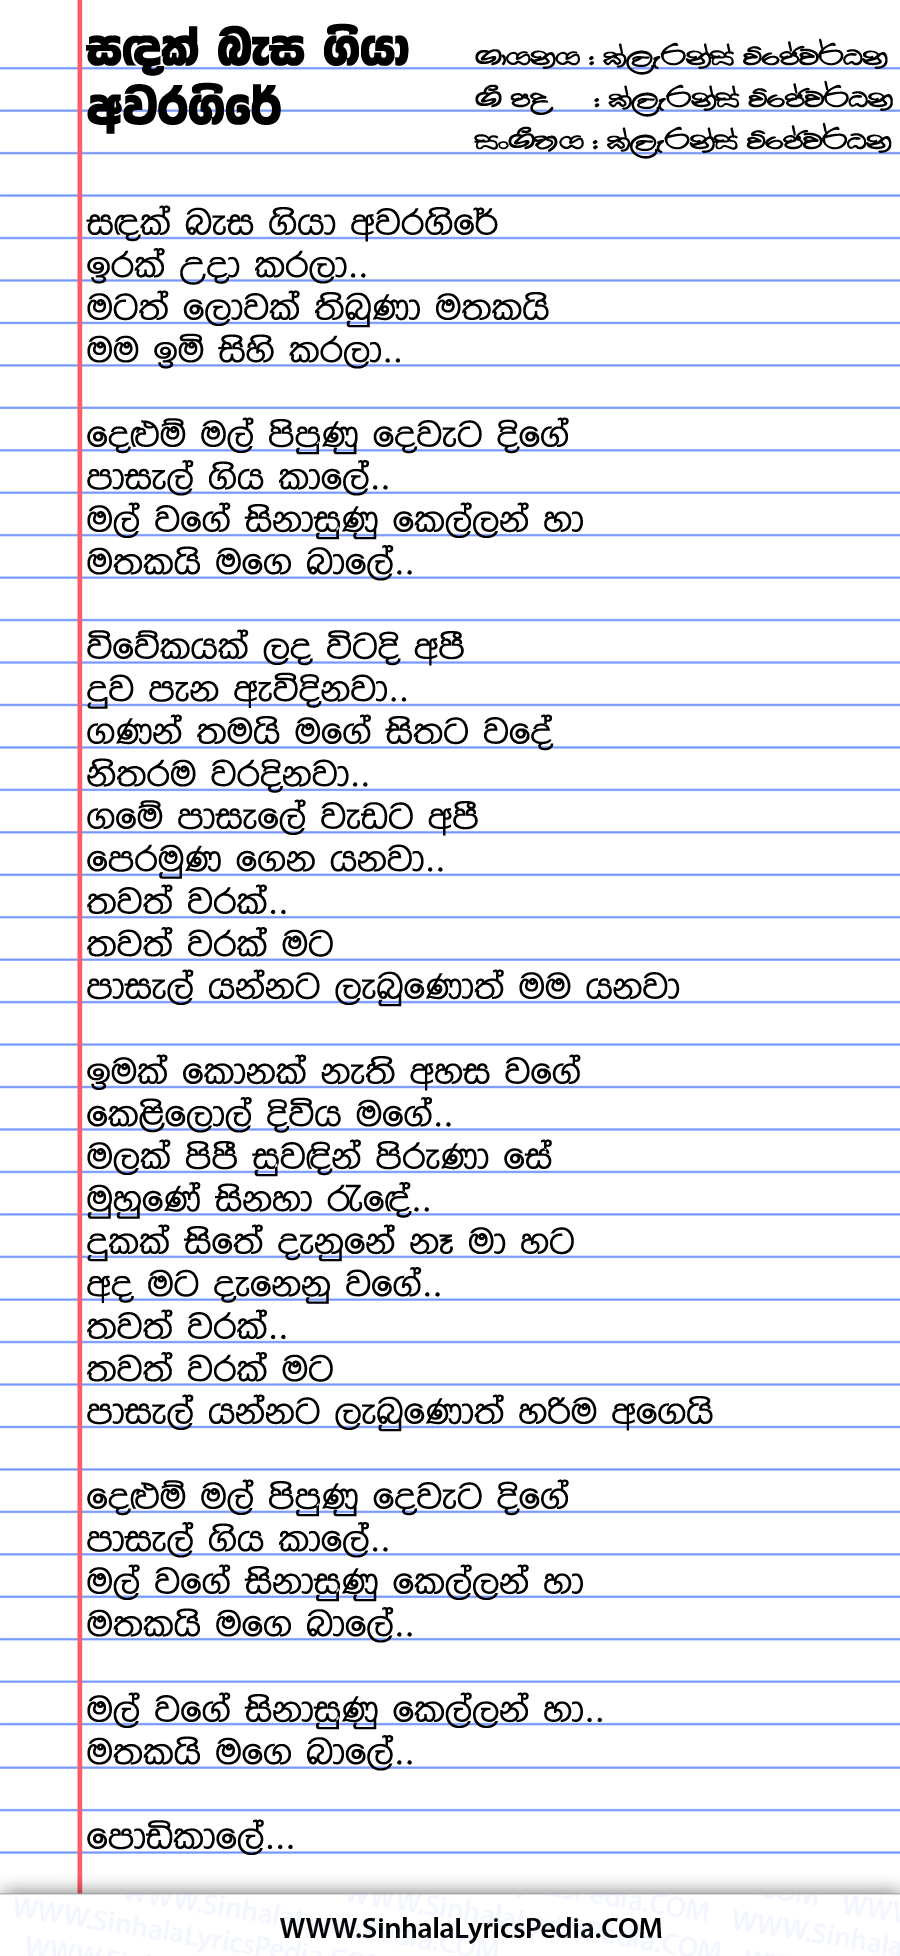 Sandak Basa Giya Awara Gire Song Lyrics